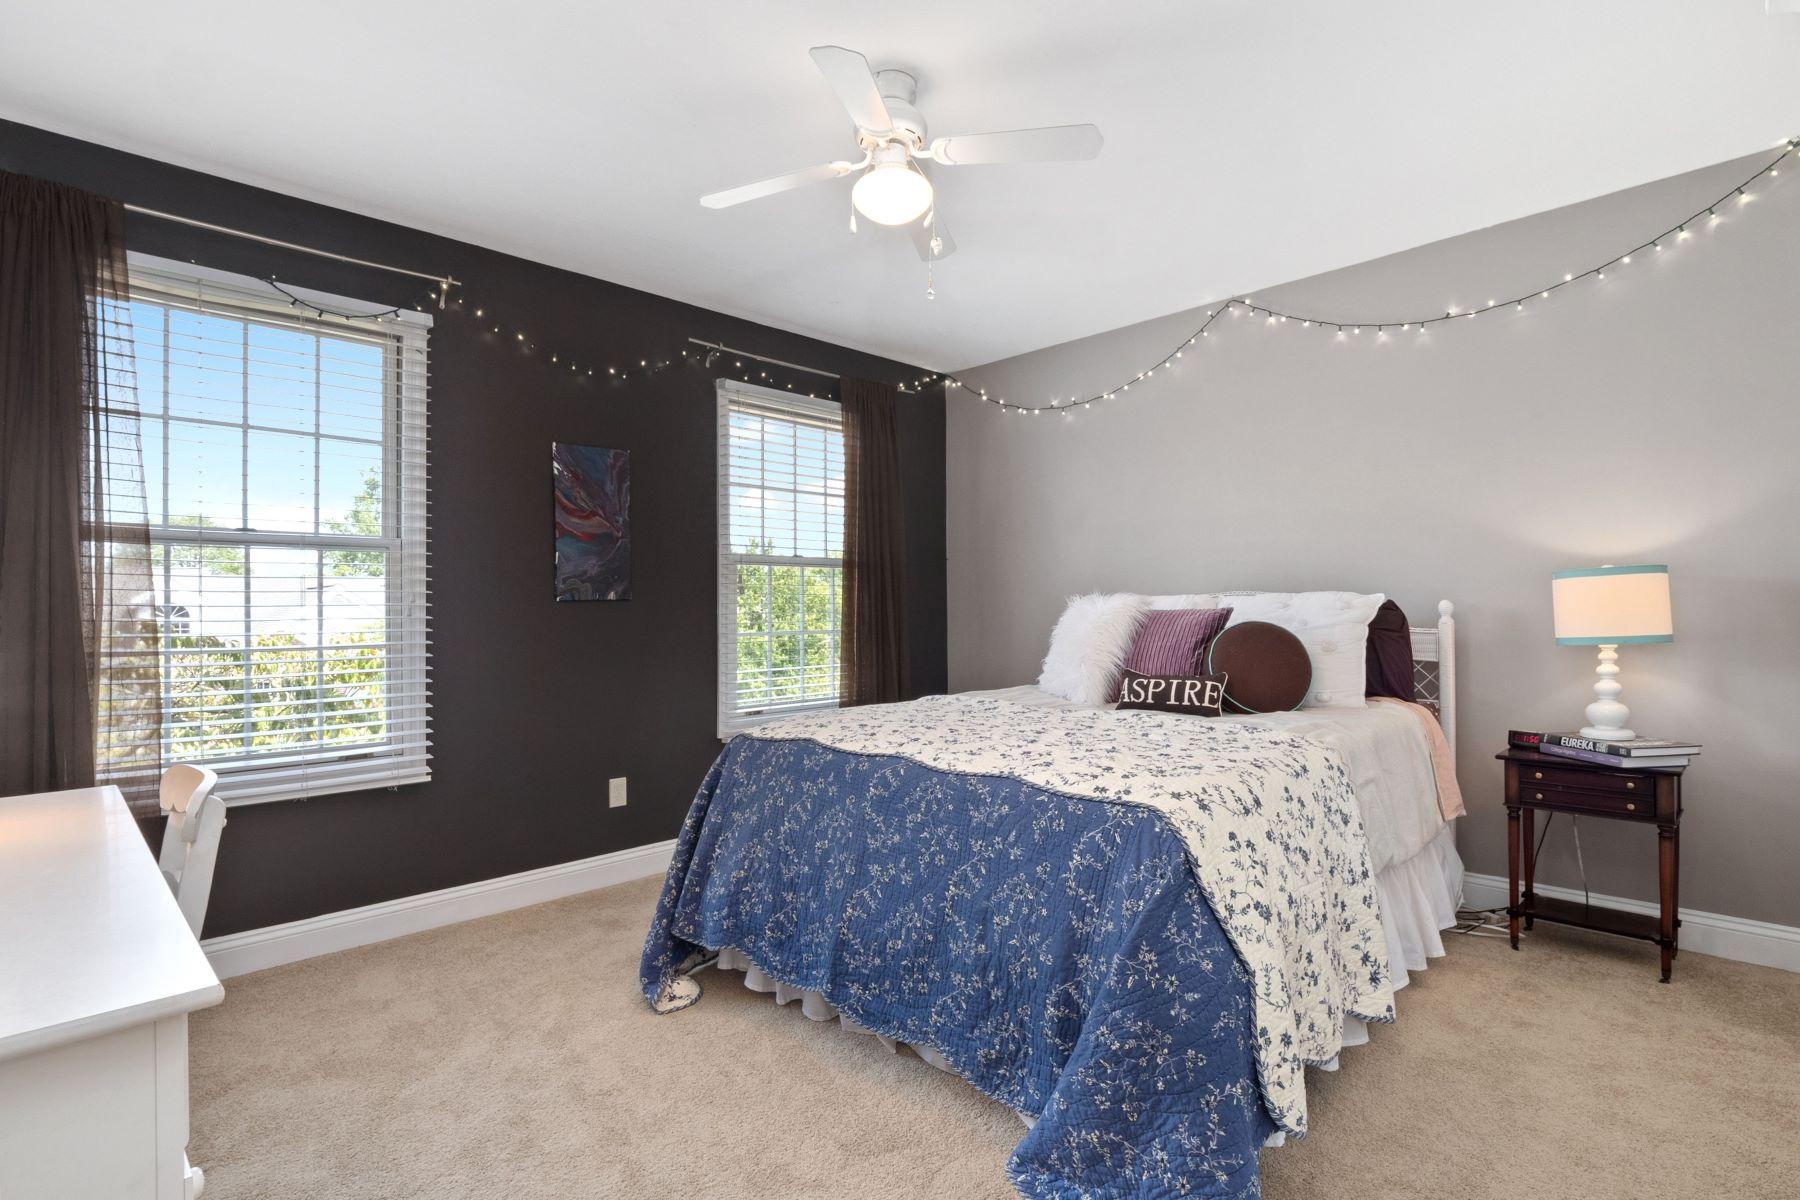 Additional photo for property listing at Prestigious Wildwood Home! 105 Boathouse Drive Wildwood, Missouri 63040 United States